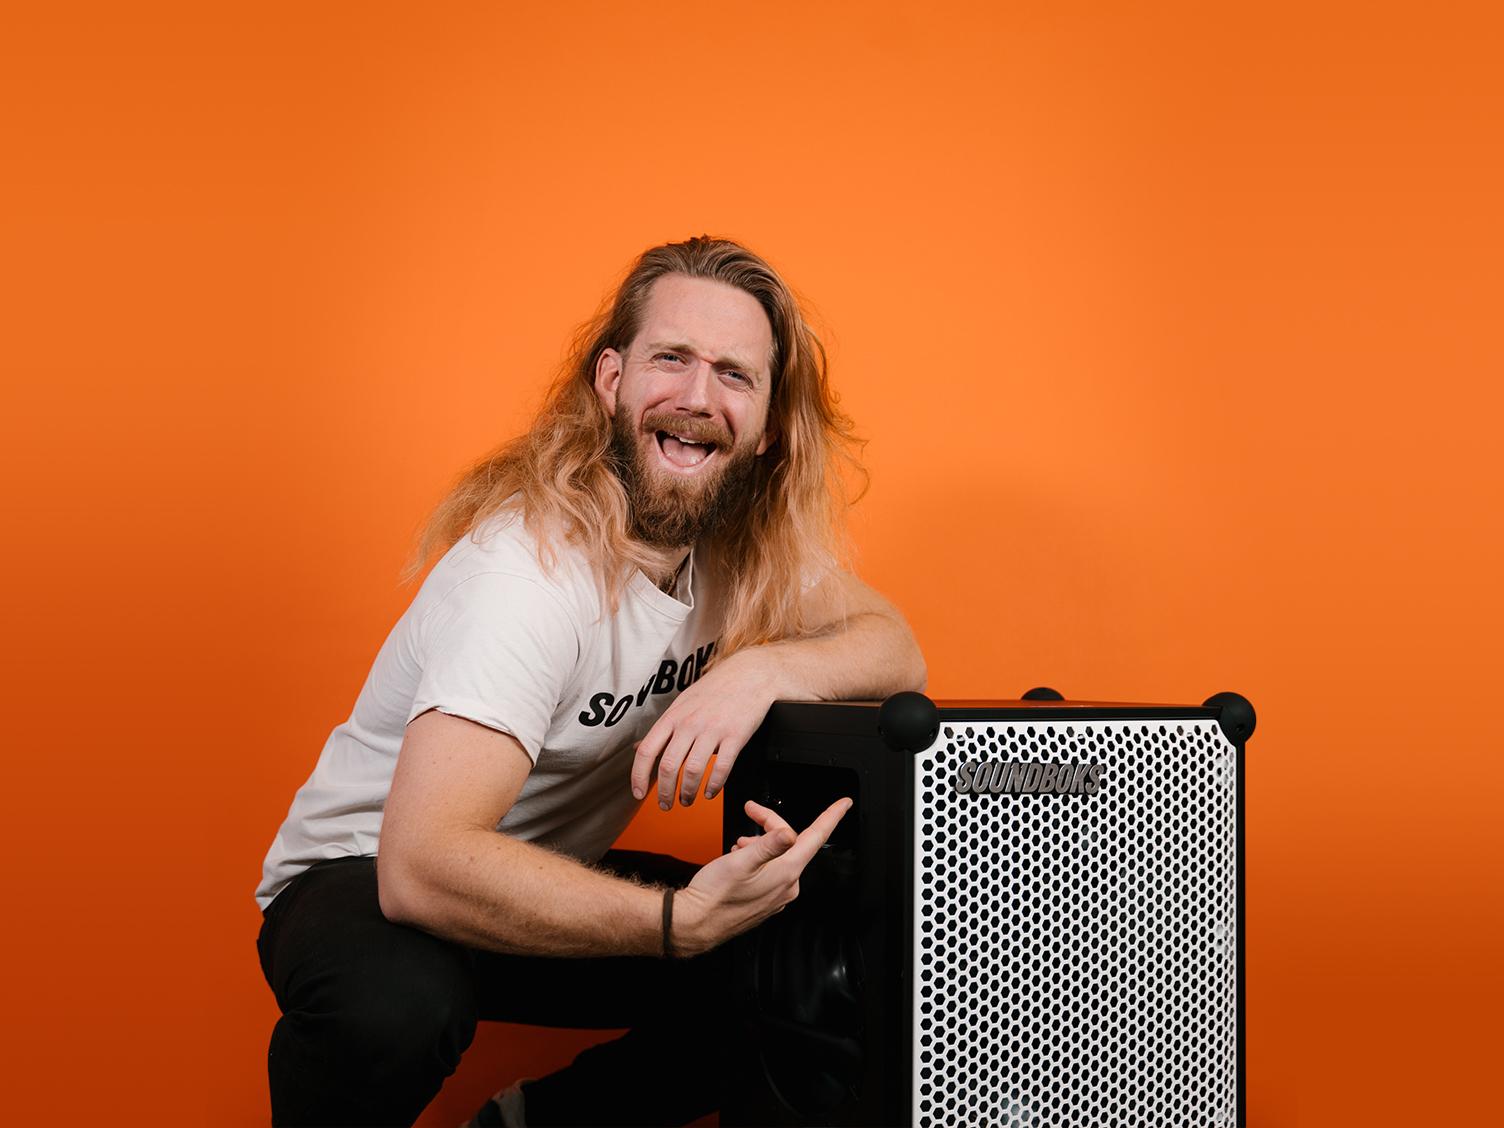 Kalle, Digital Project Lead at SOUNDBOKS in front of an Orange Background.